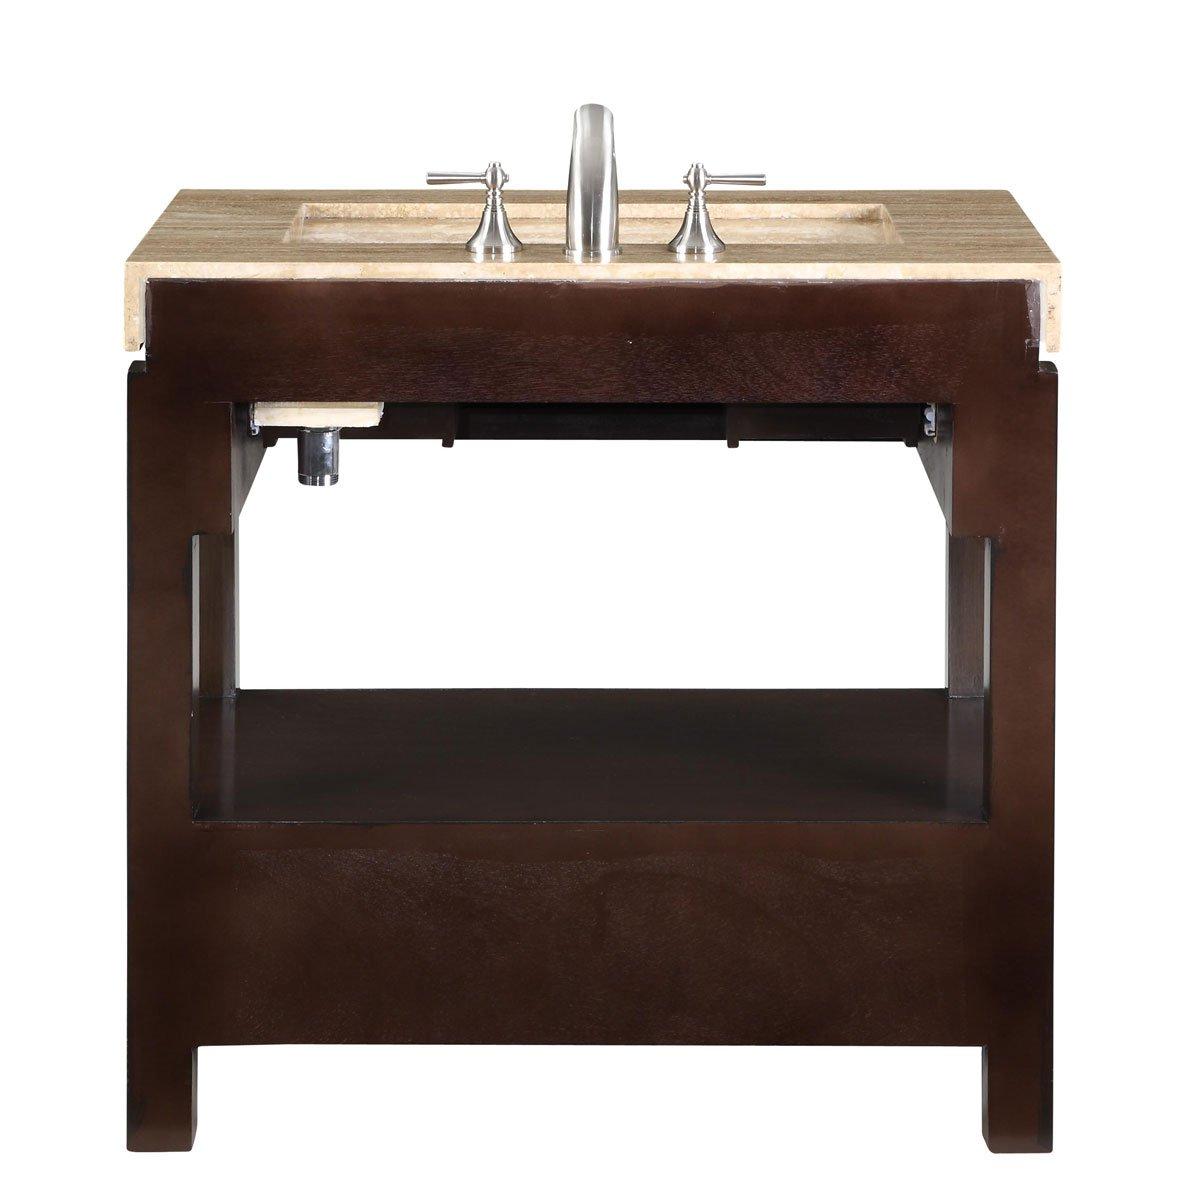 36 inch single sink bathroom vanity with built in led lighting - Amazon Com Silkroad Exclusive Dark Walnut Stone Top Single Sink Bathroom Vanity With Cabinet 36 Inch Home Kitchen